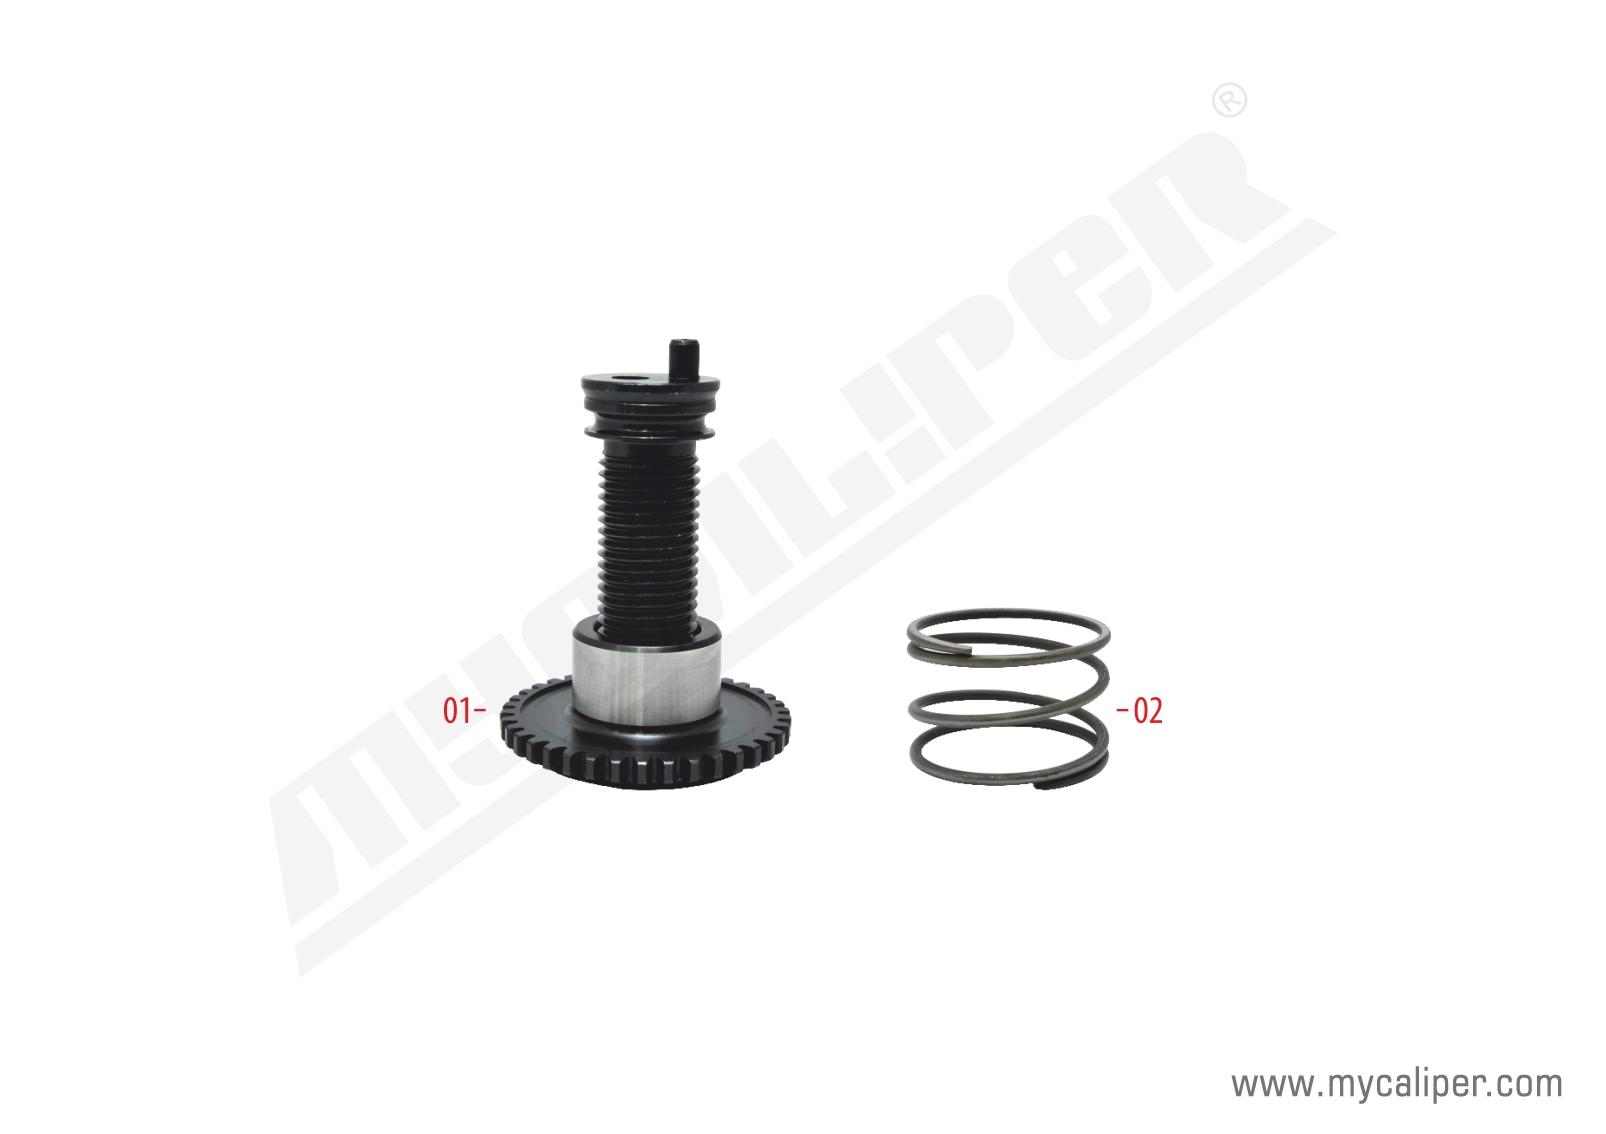 Caliper Adjuster Gear (Right)